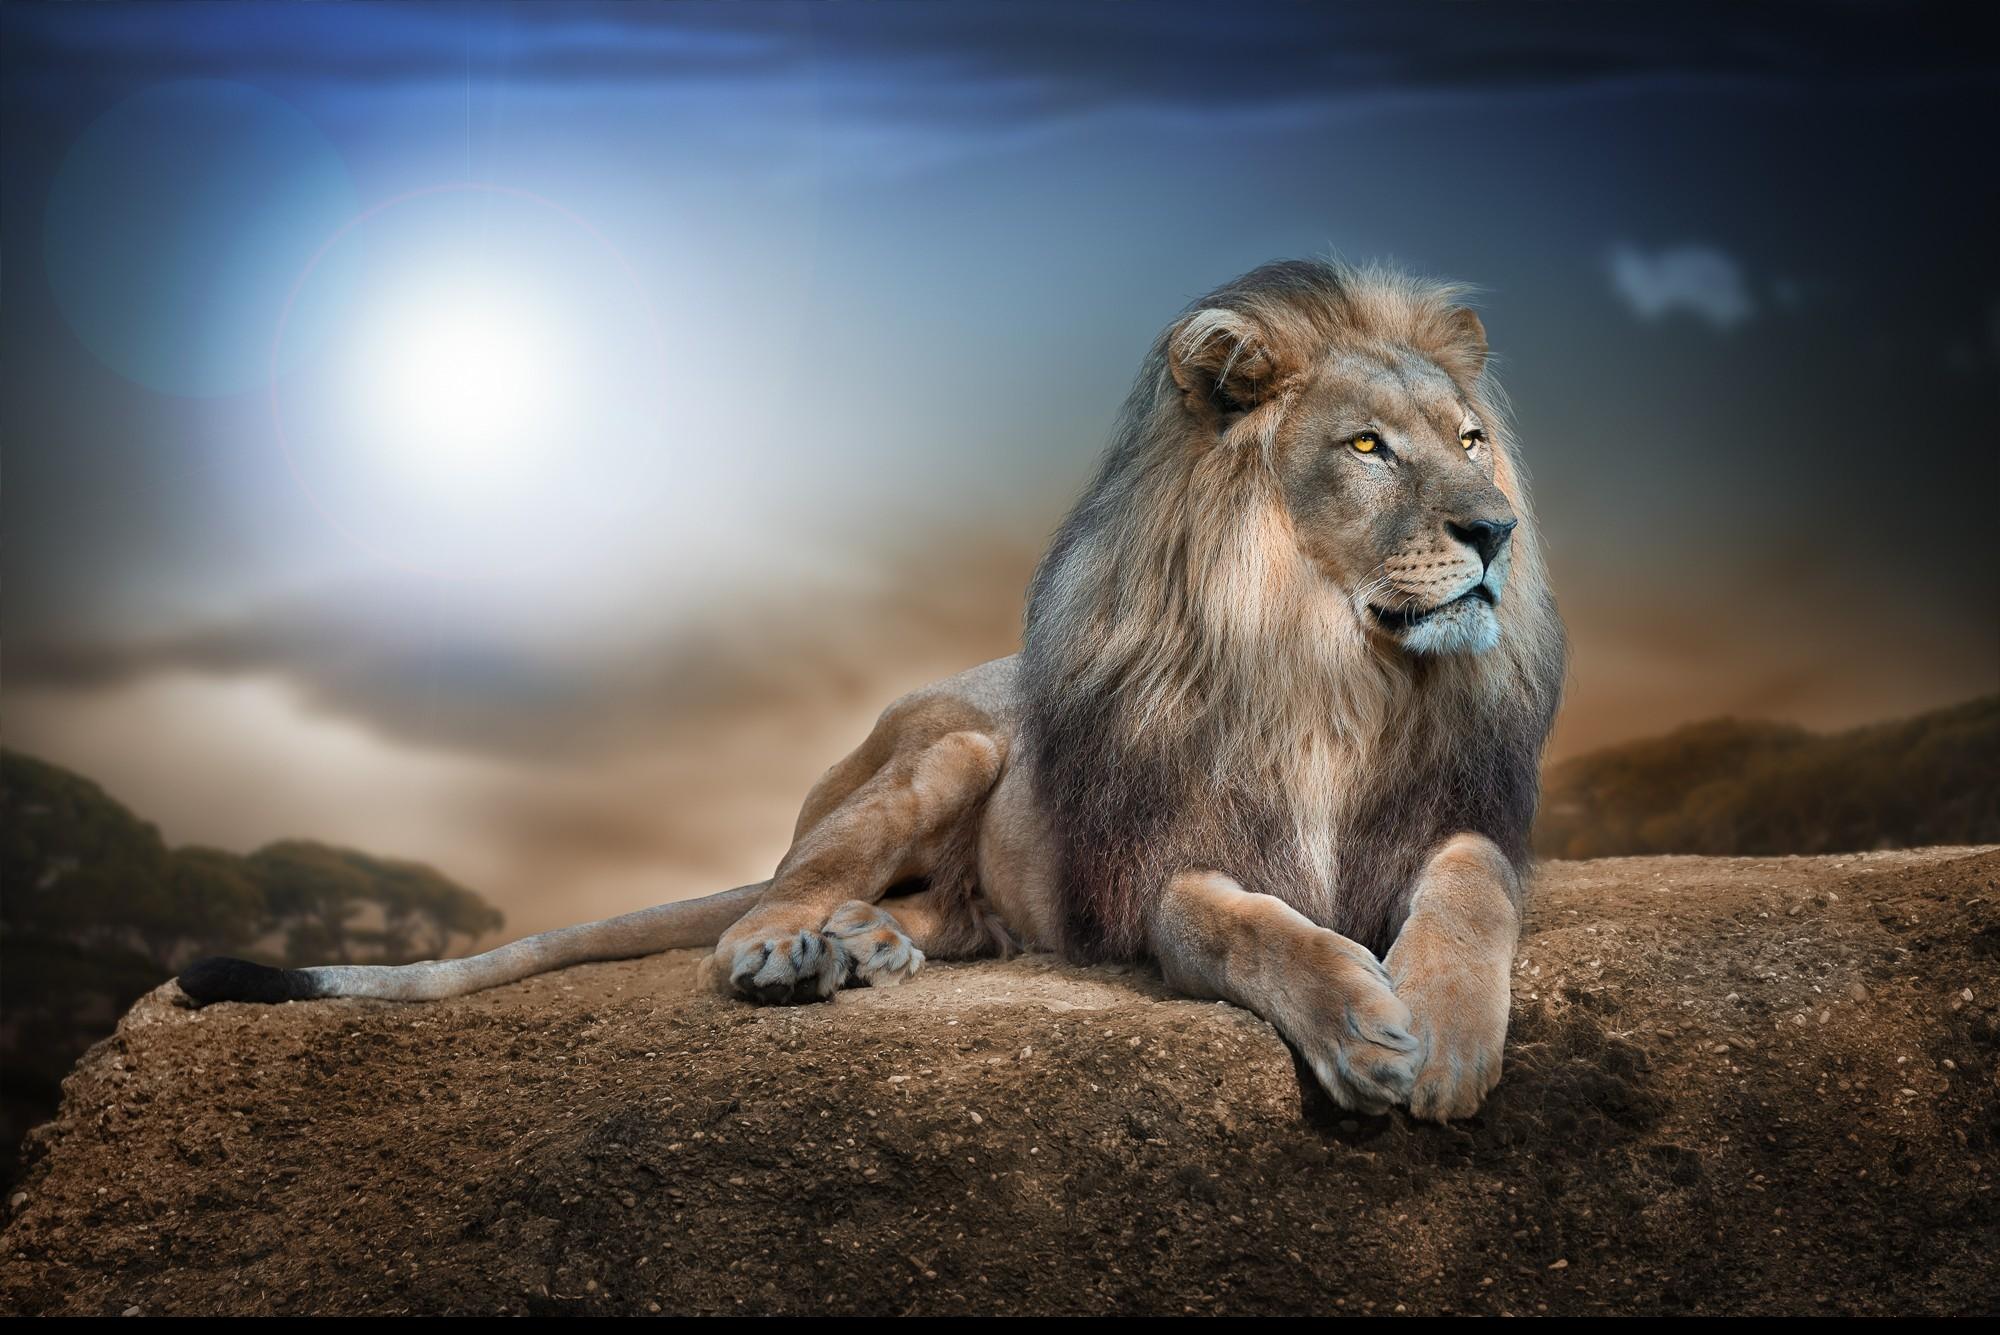 Lion Superbe Fond D Ecran Fond D Ecran Hd